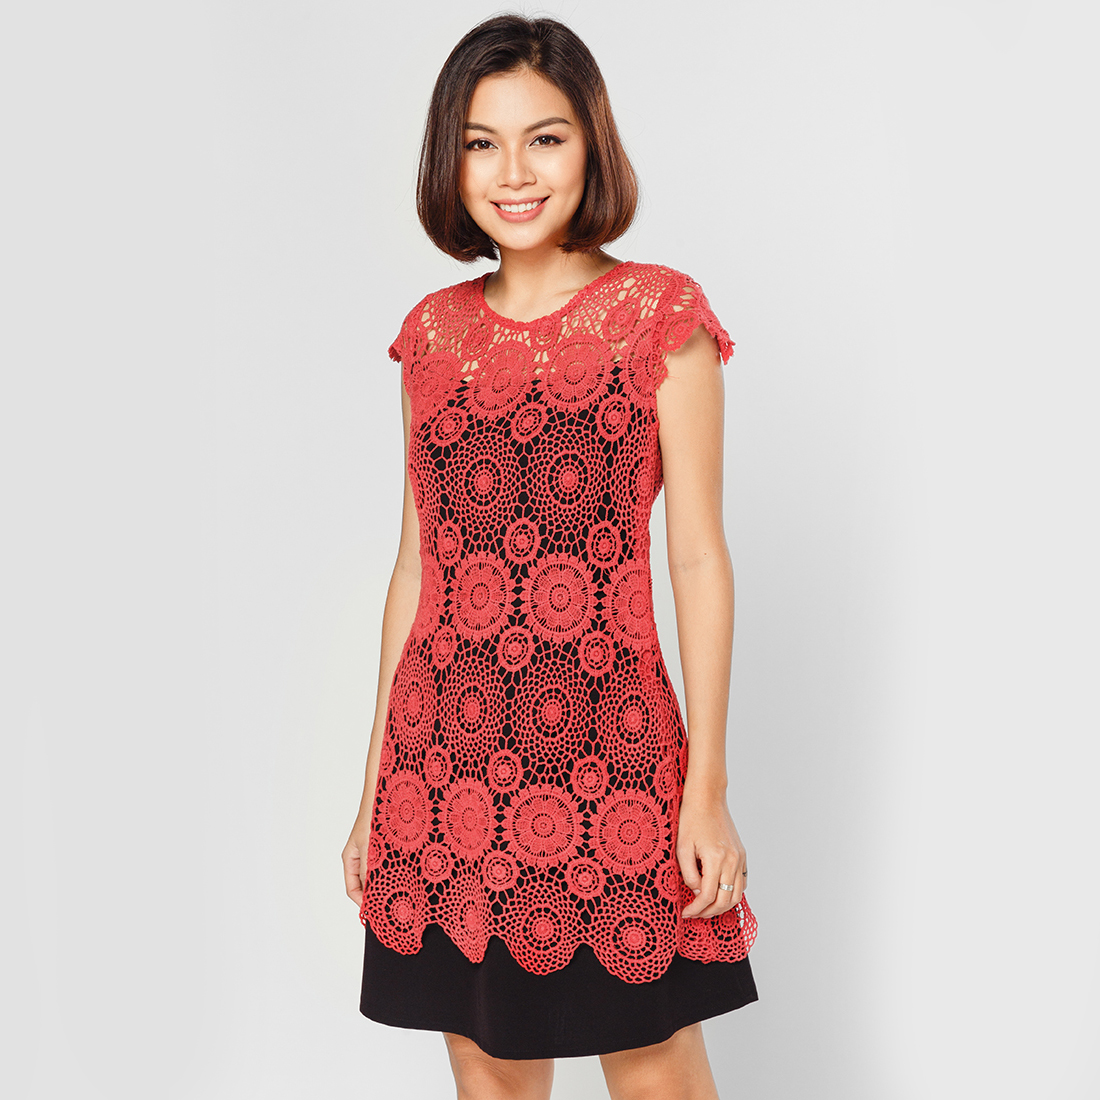 Đầm suông thời trang Eden phối ren cao cấp - D249